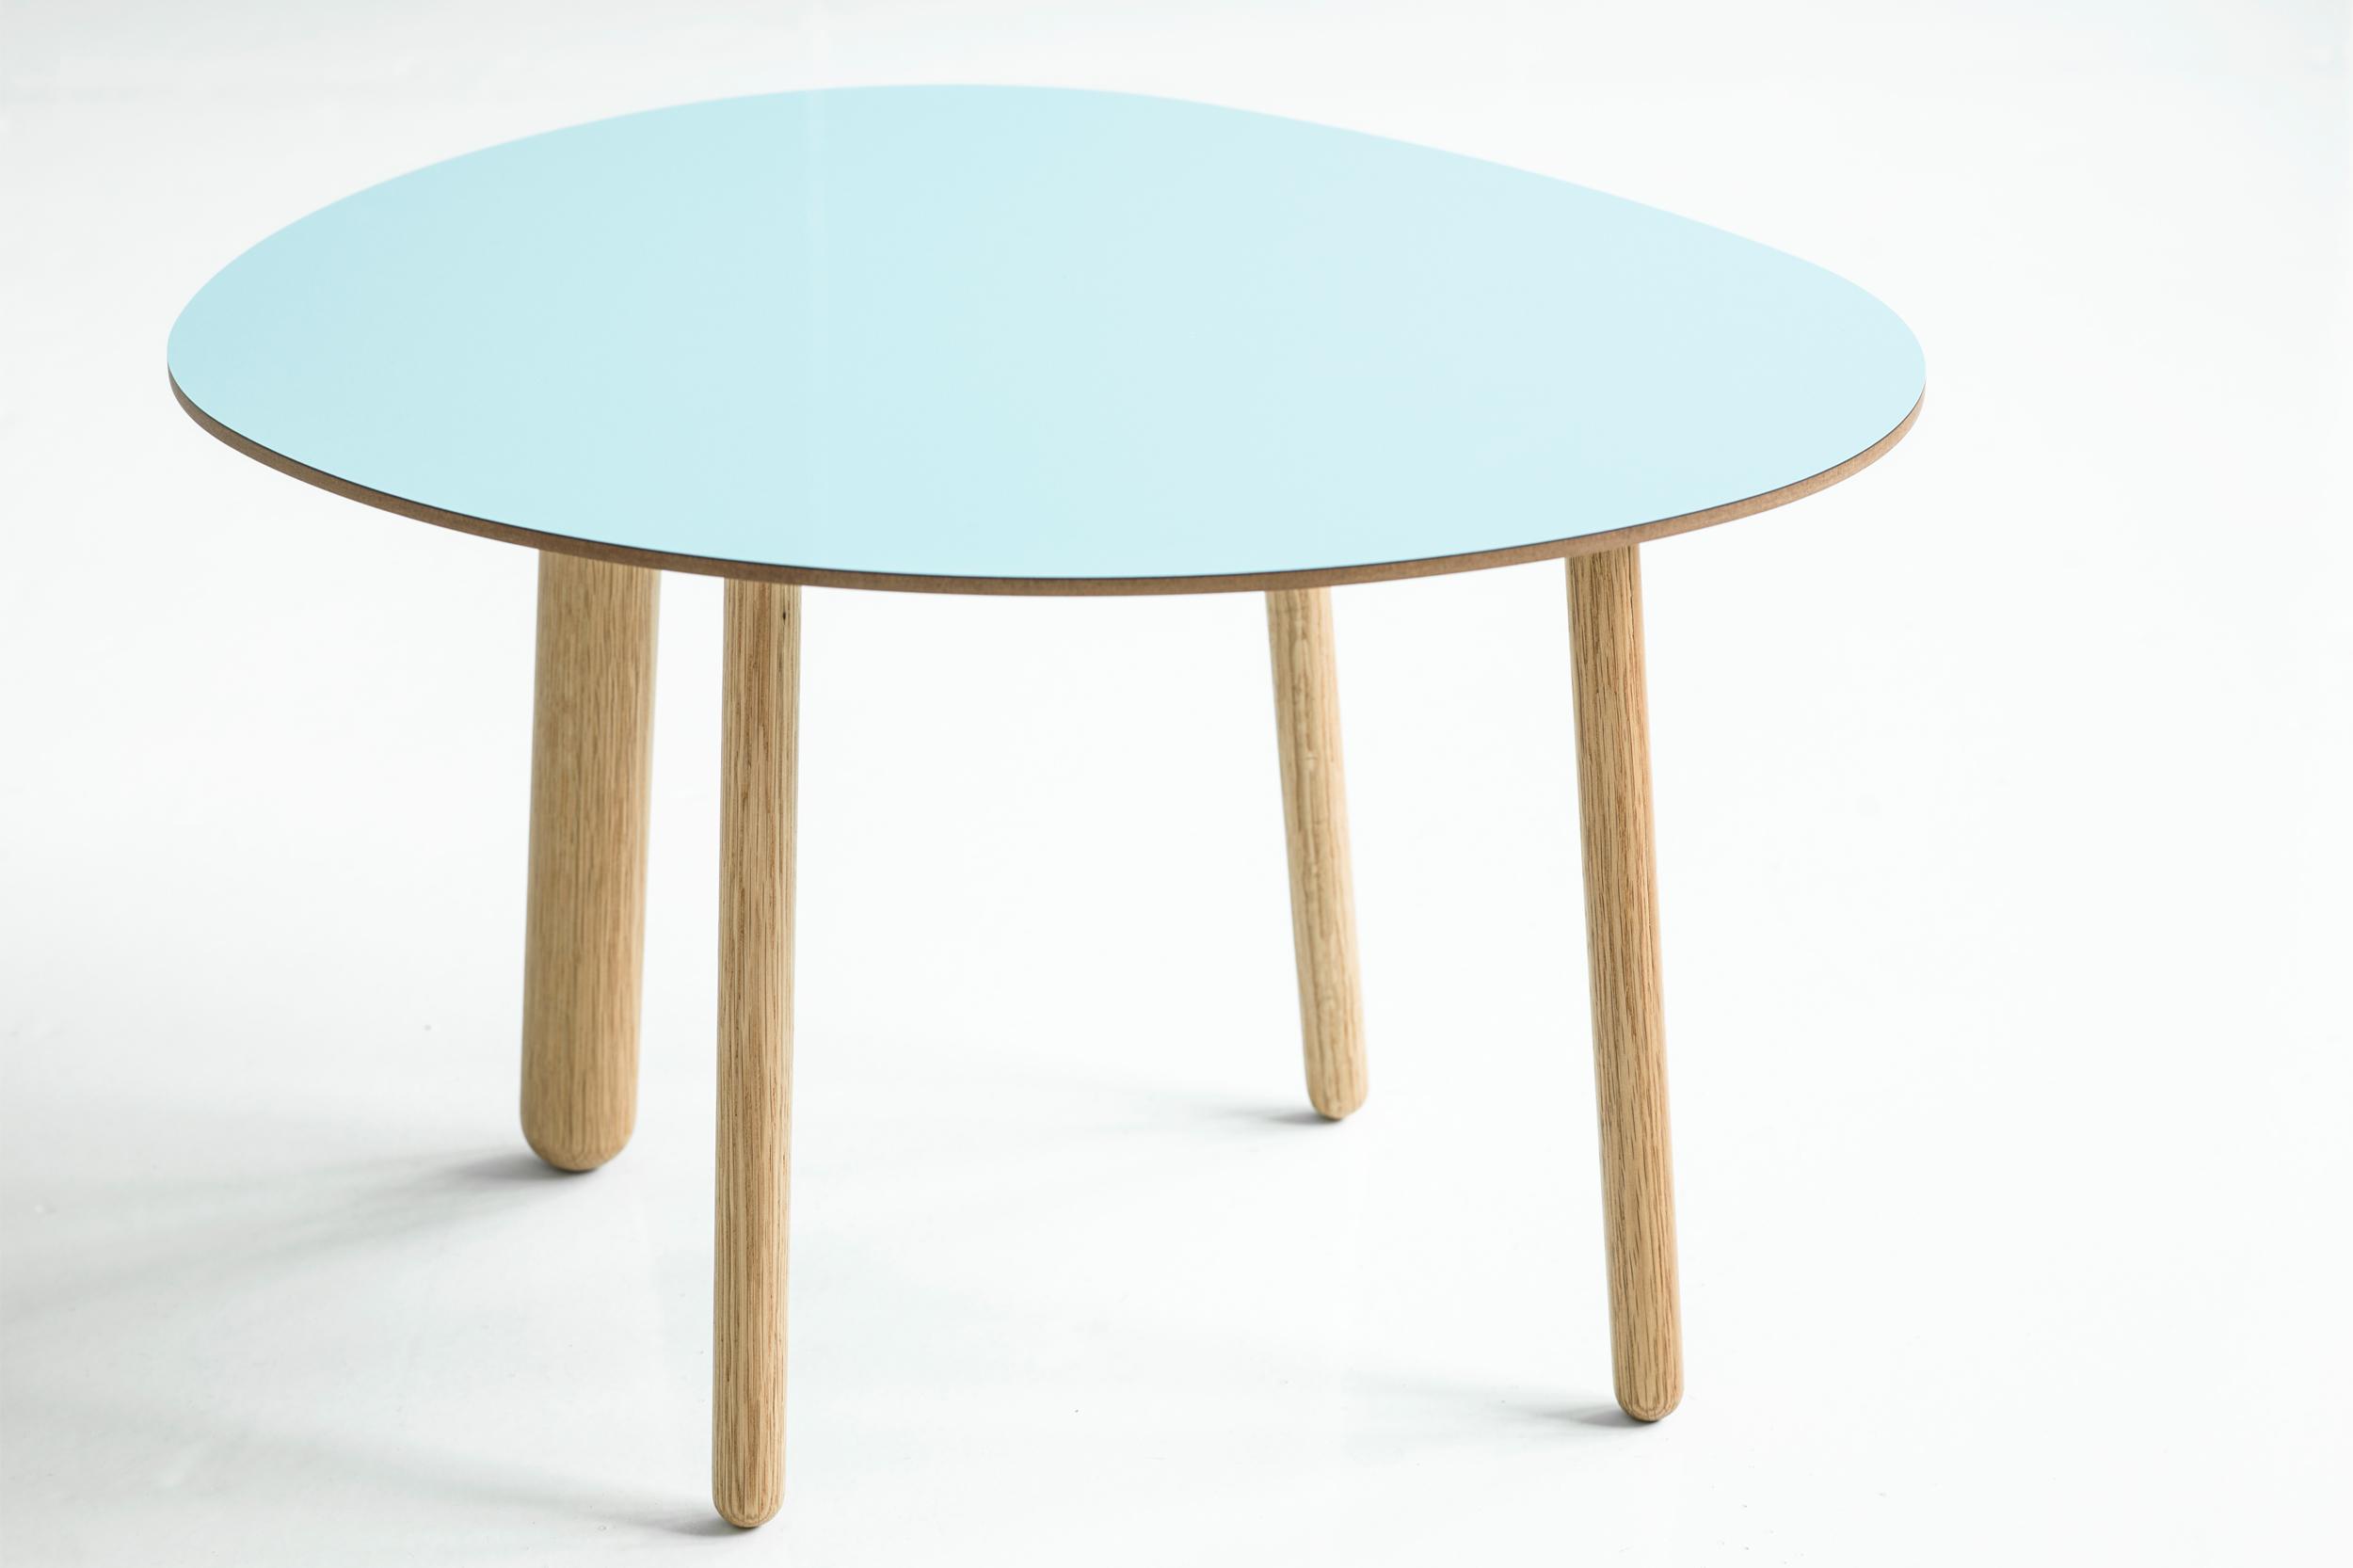 Morris coffee table model 1 in glossy lagoon blue